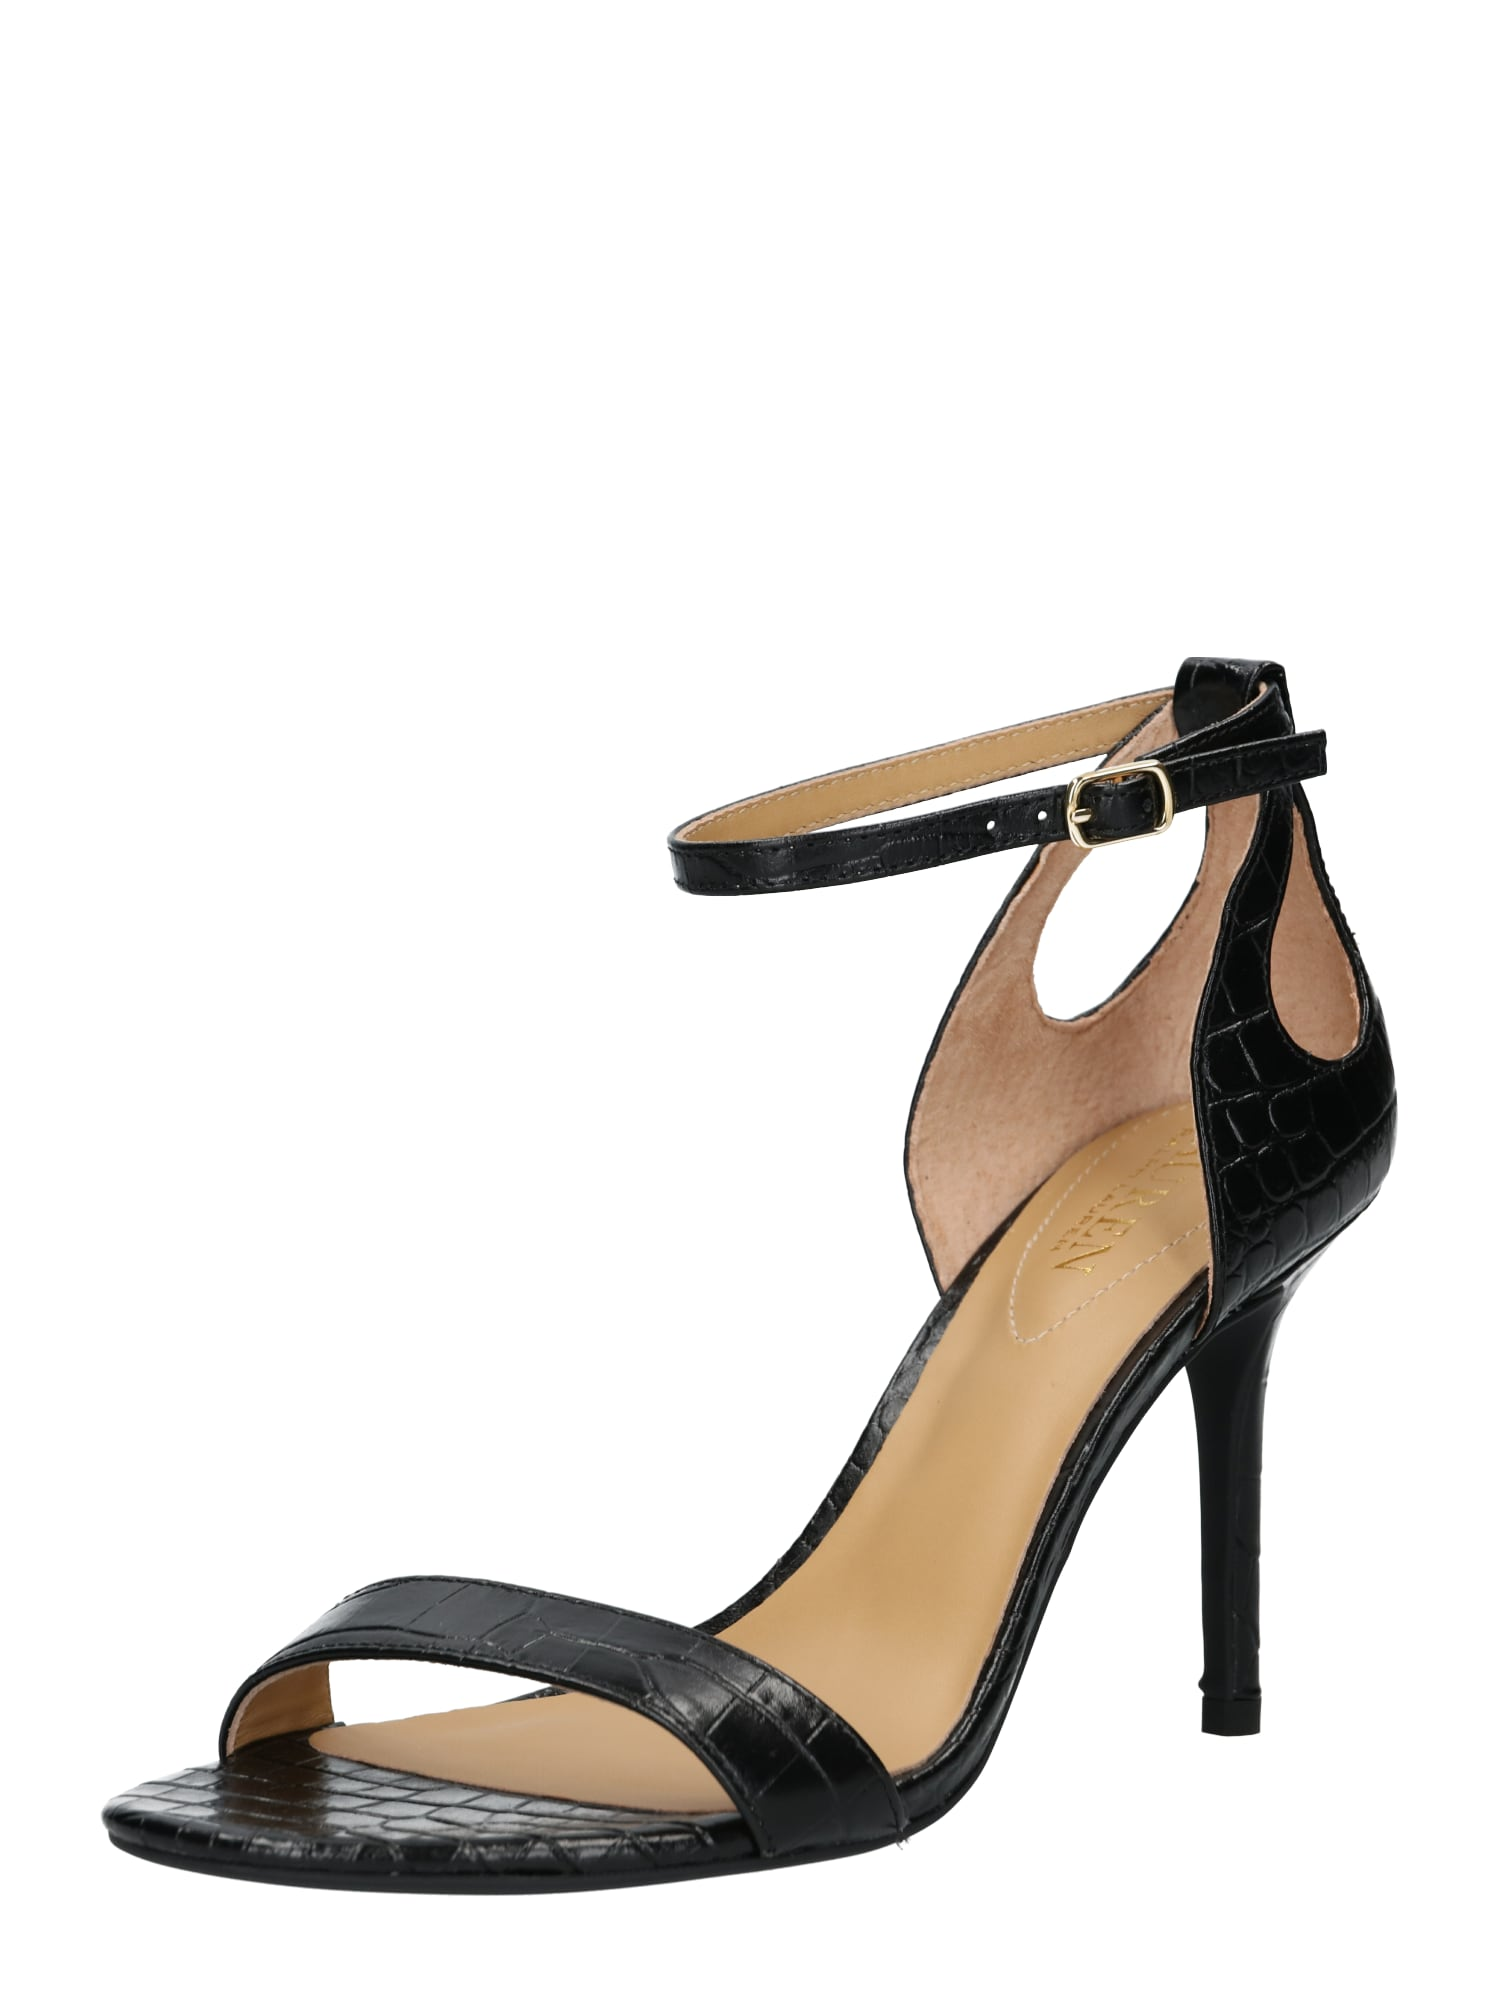 Sandály GRETCHIN-SANDALS černá Lauren Ralph Lauren